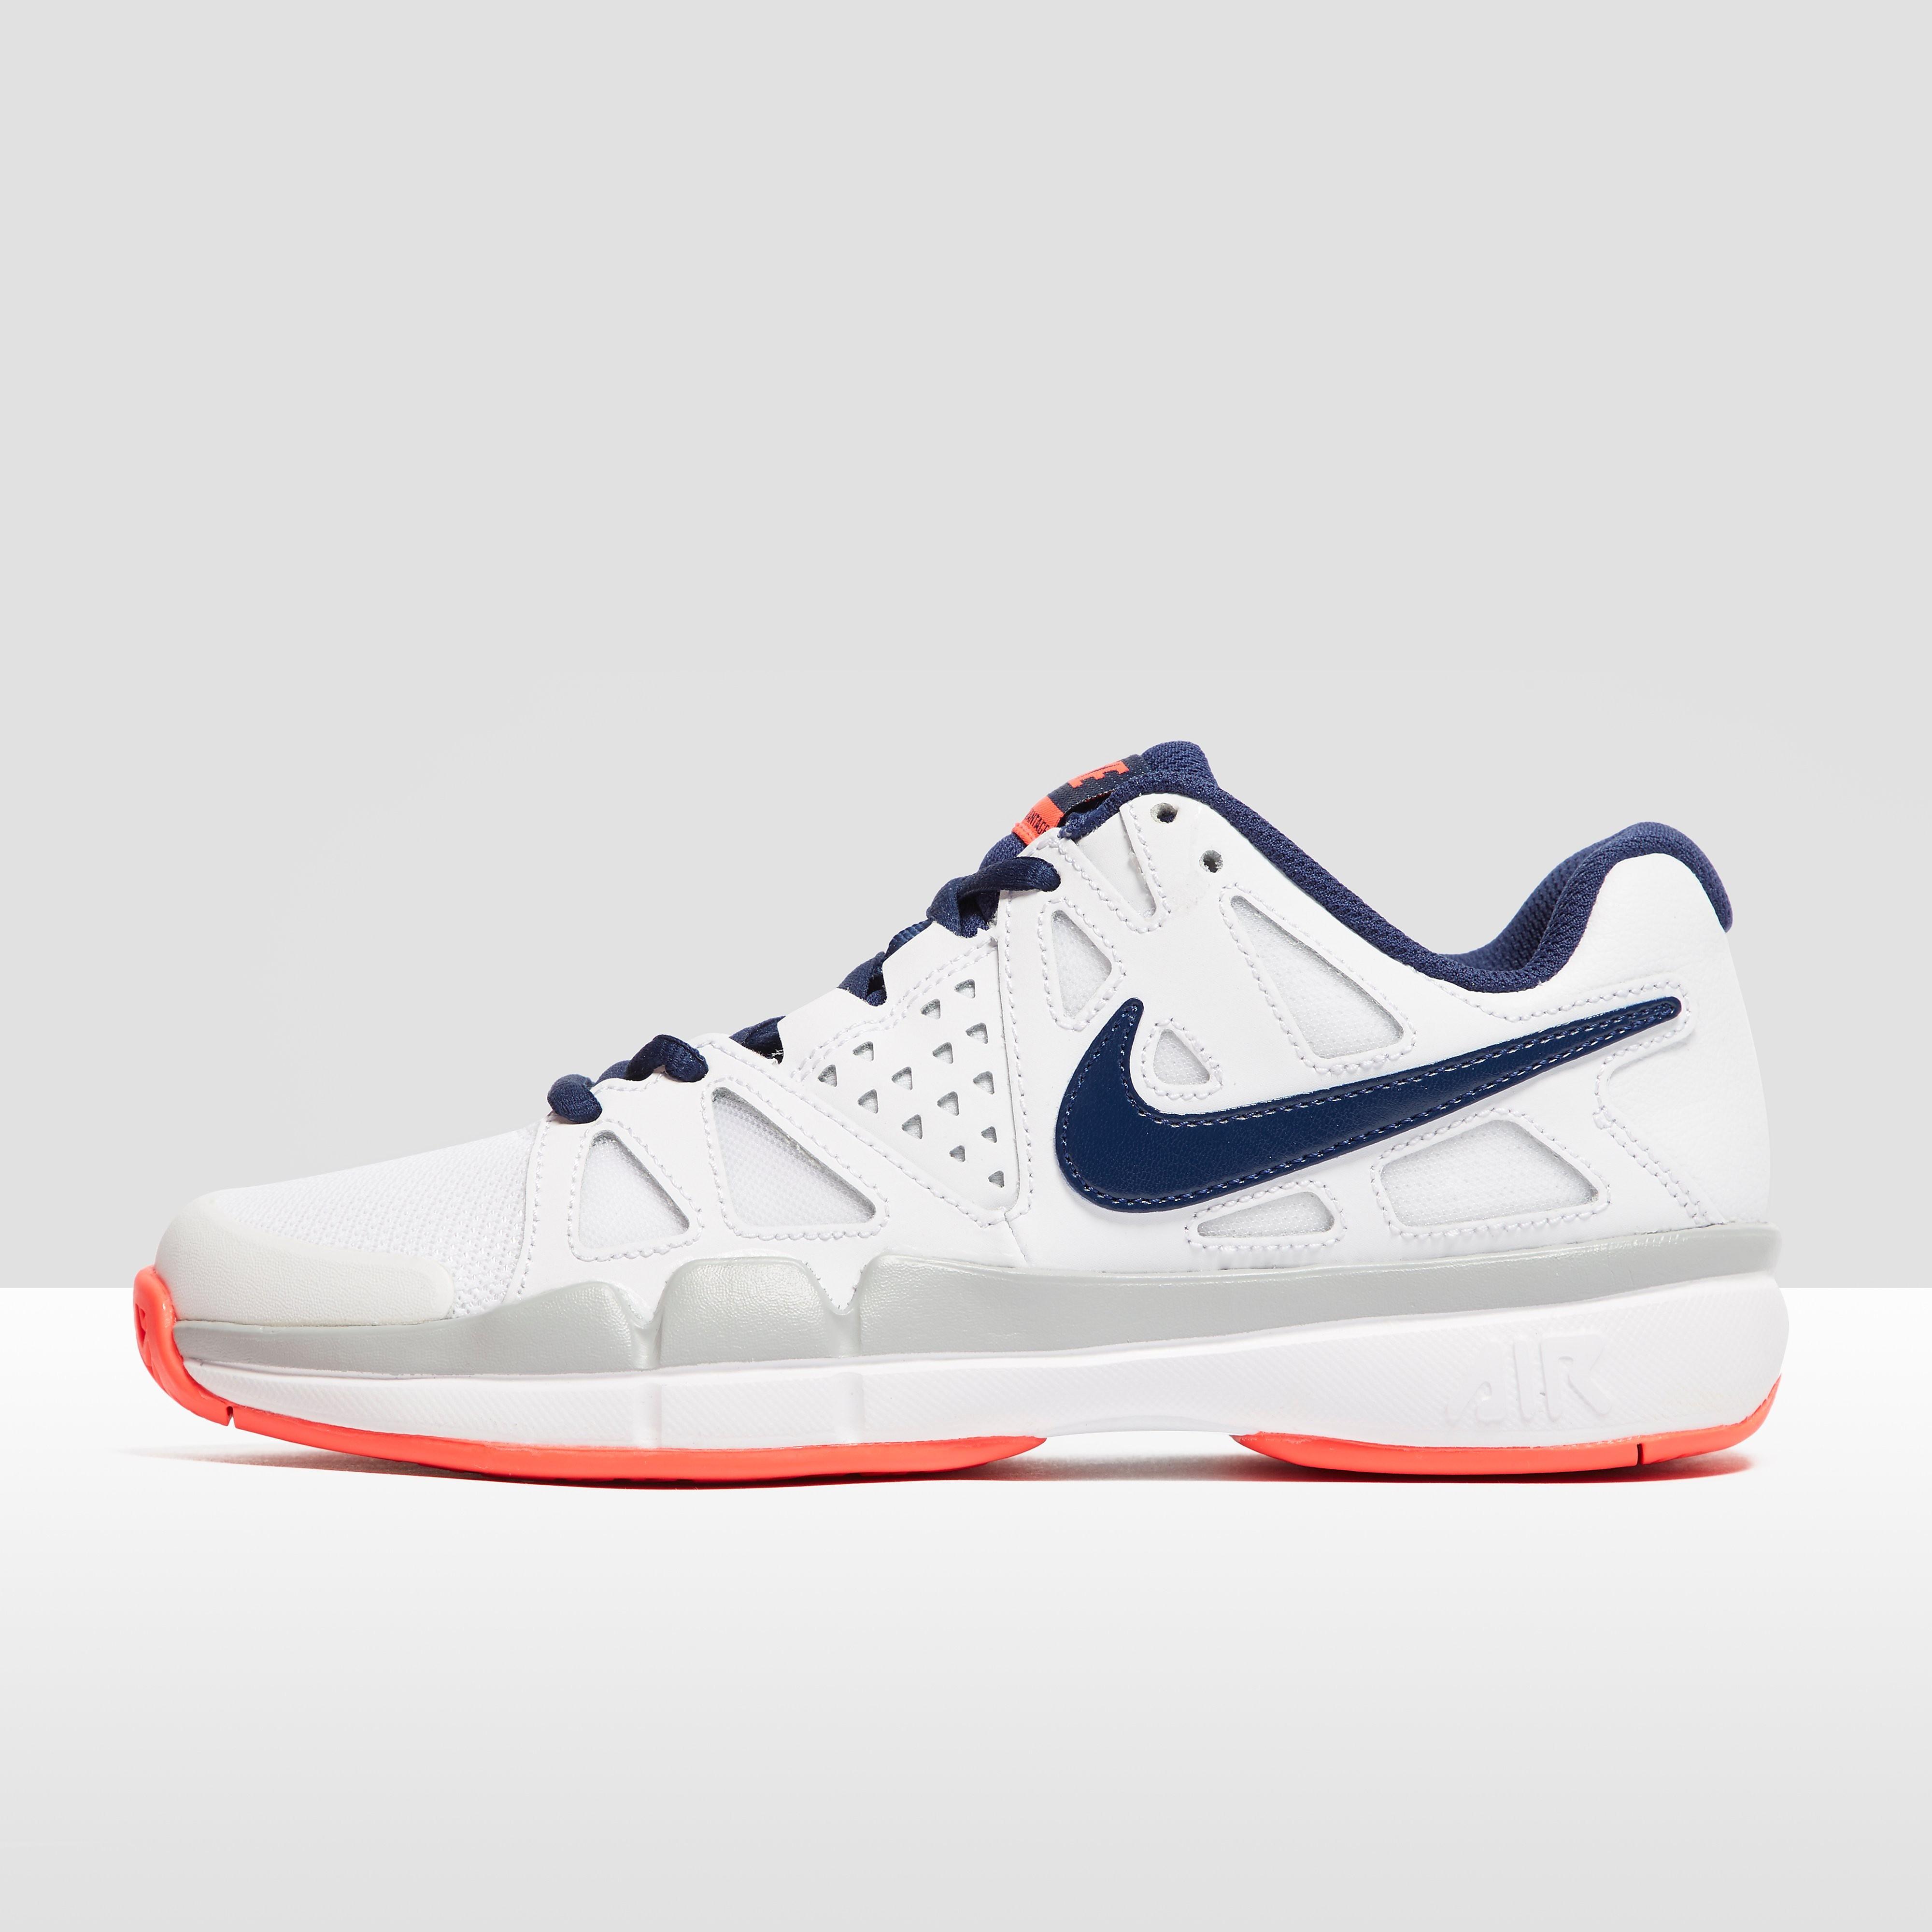 Nike NIKECOURT AIR VAPOR ADVANTAGE Women's Tennis Shoes